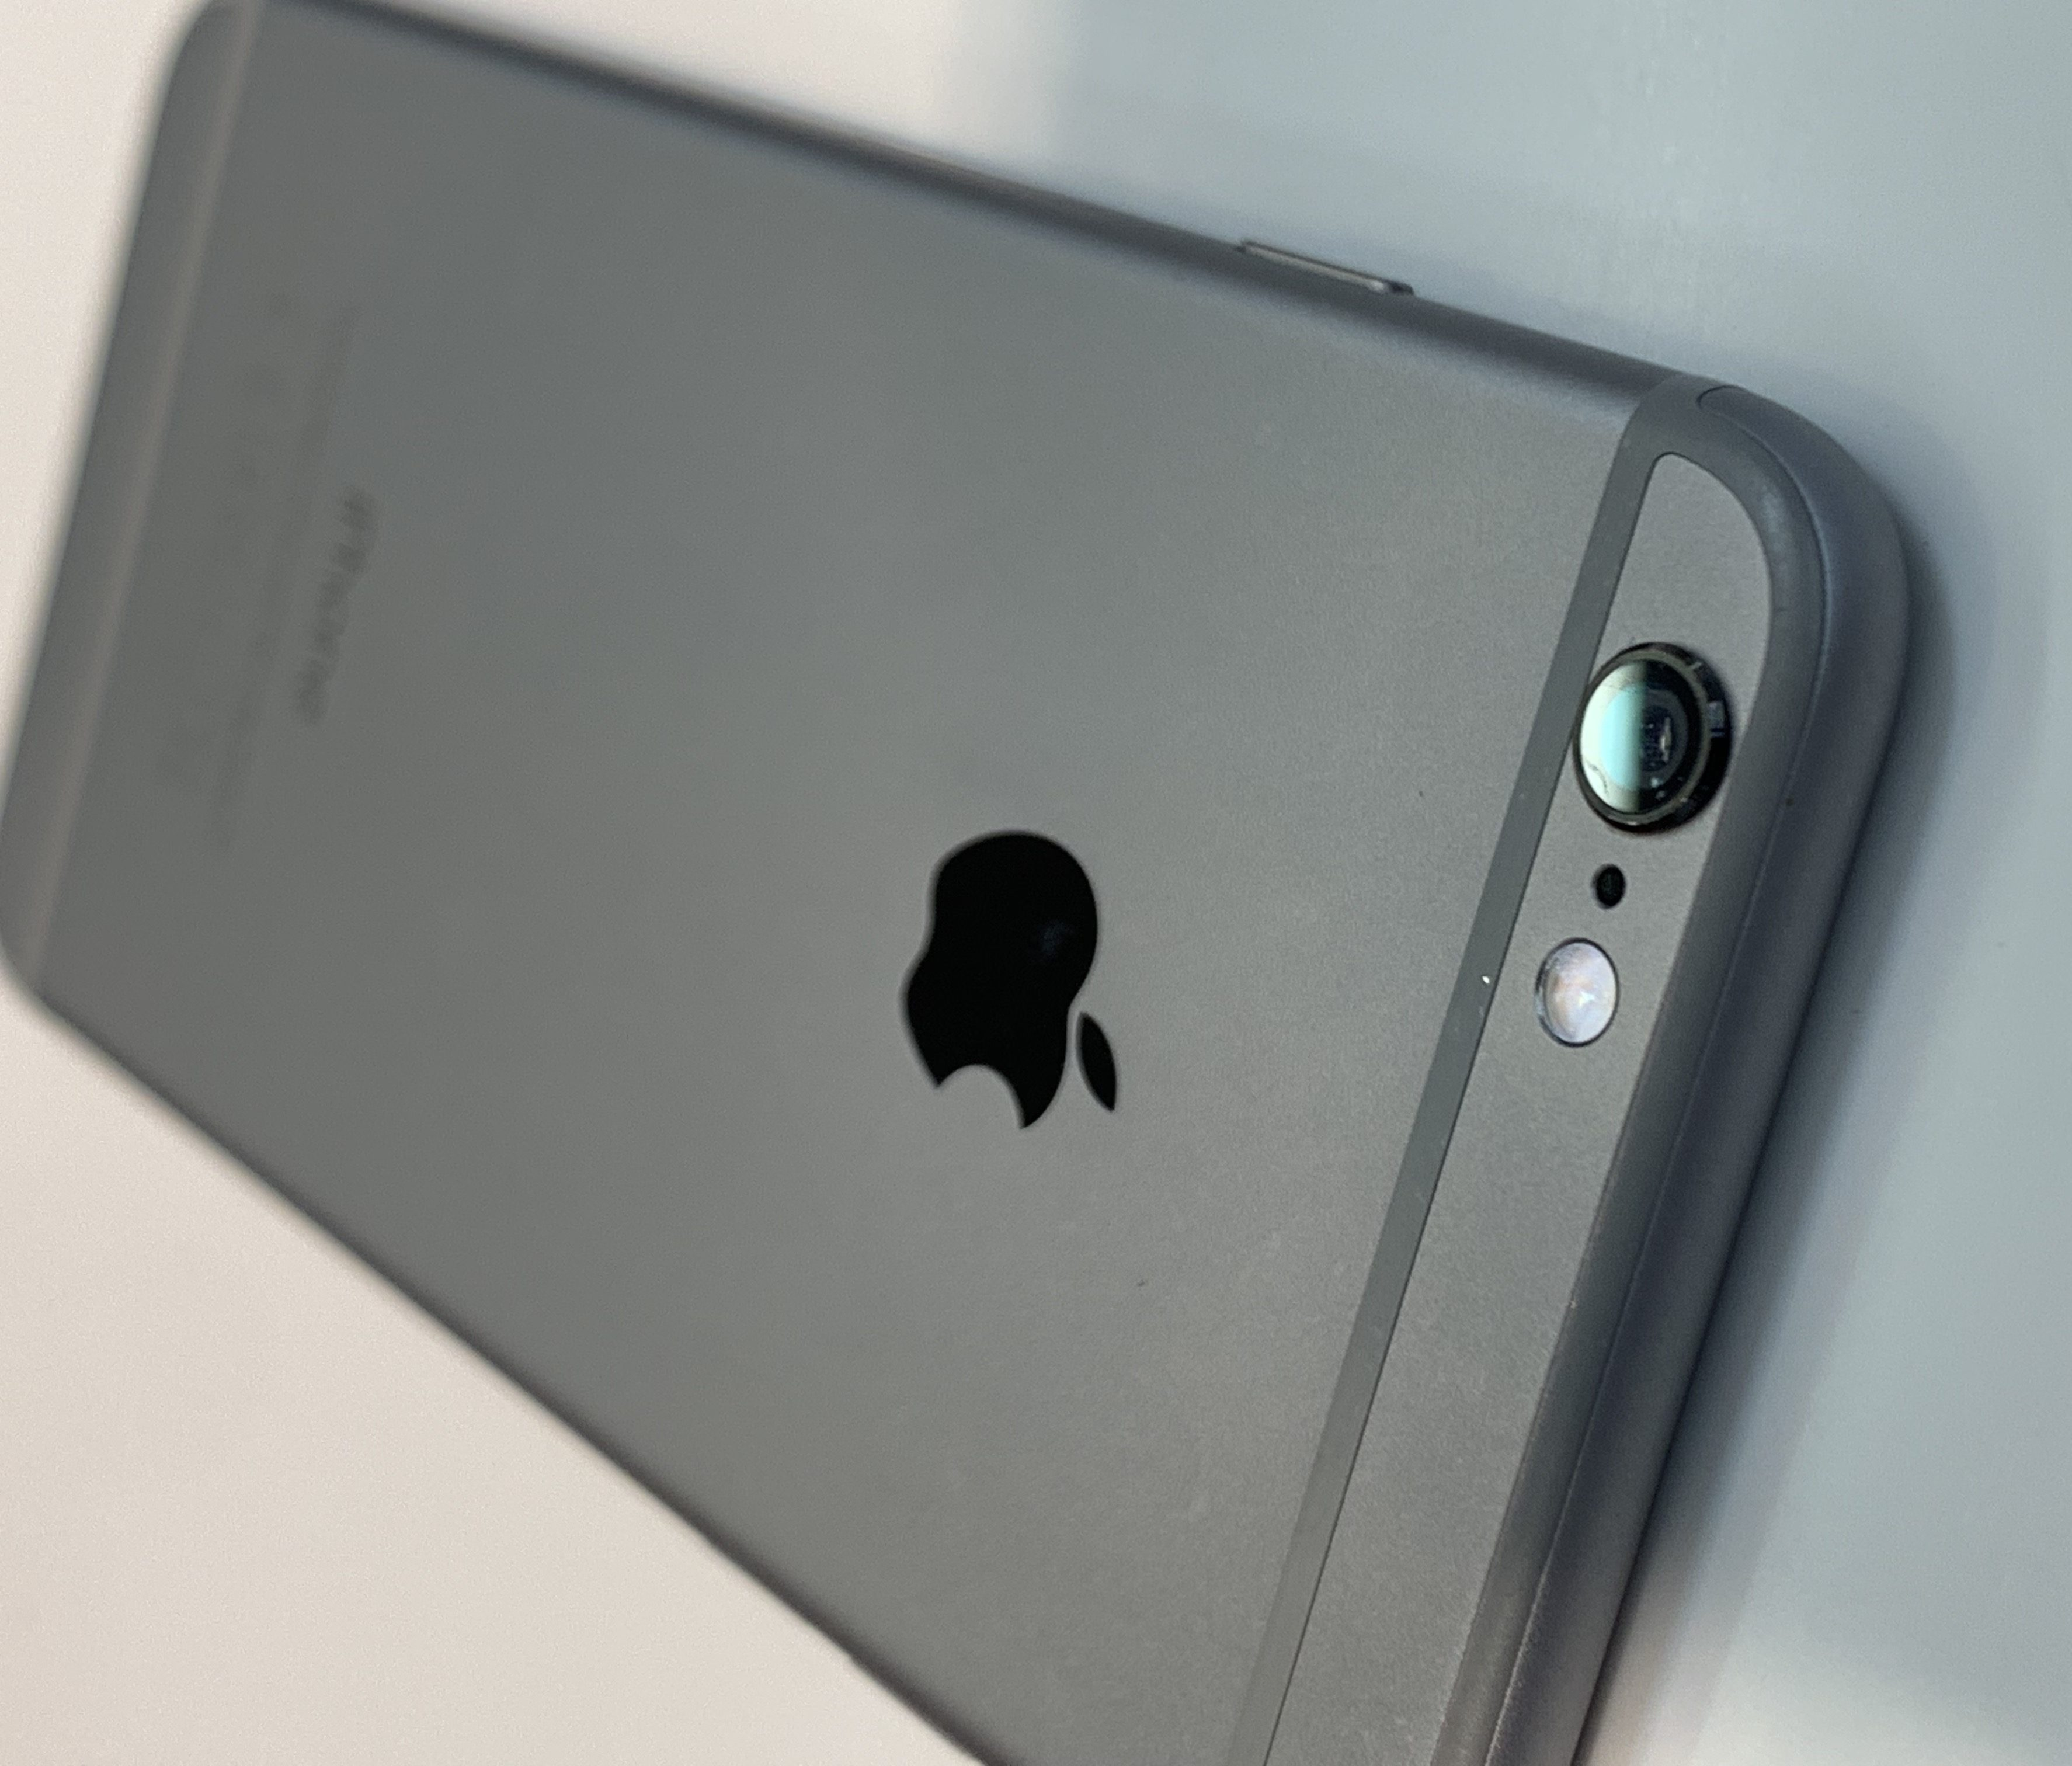 iPhone 6 16GB, 16 GB, Space Gray, bild 5